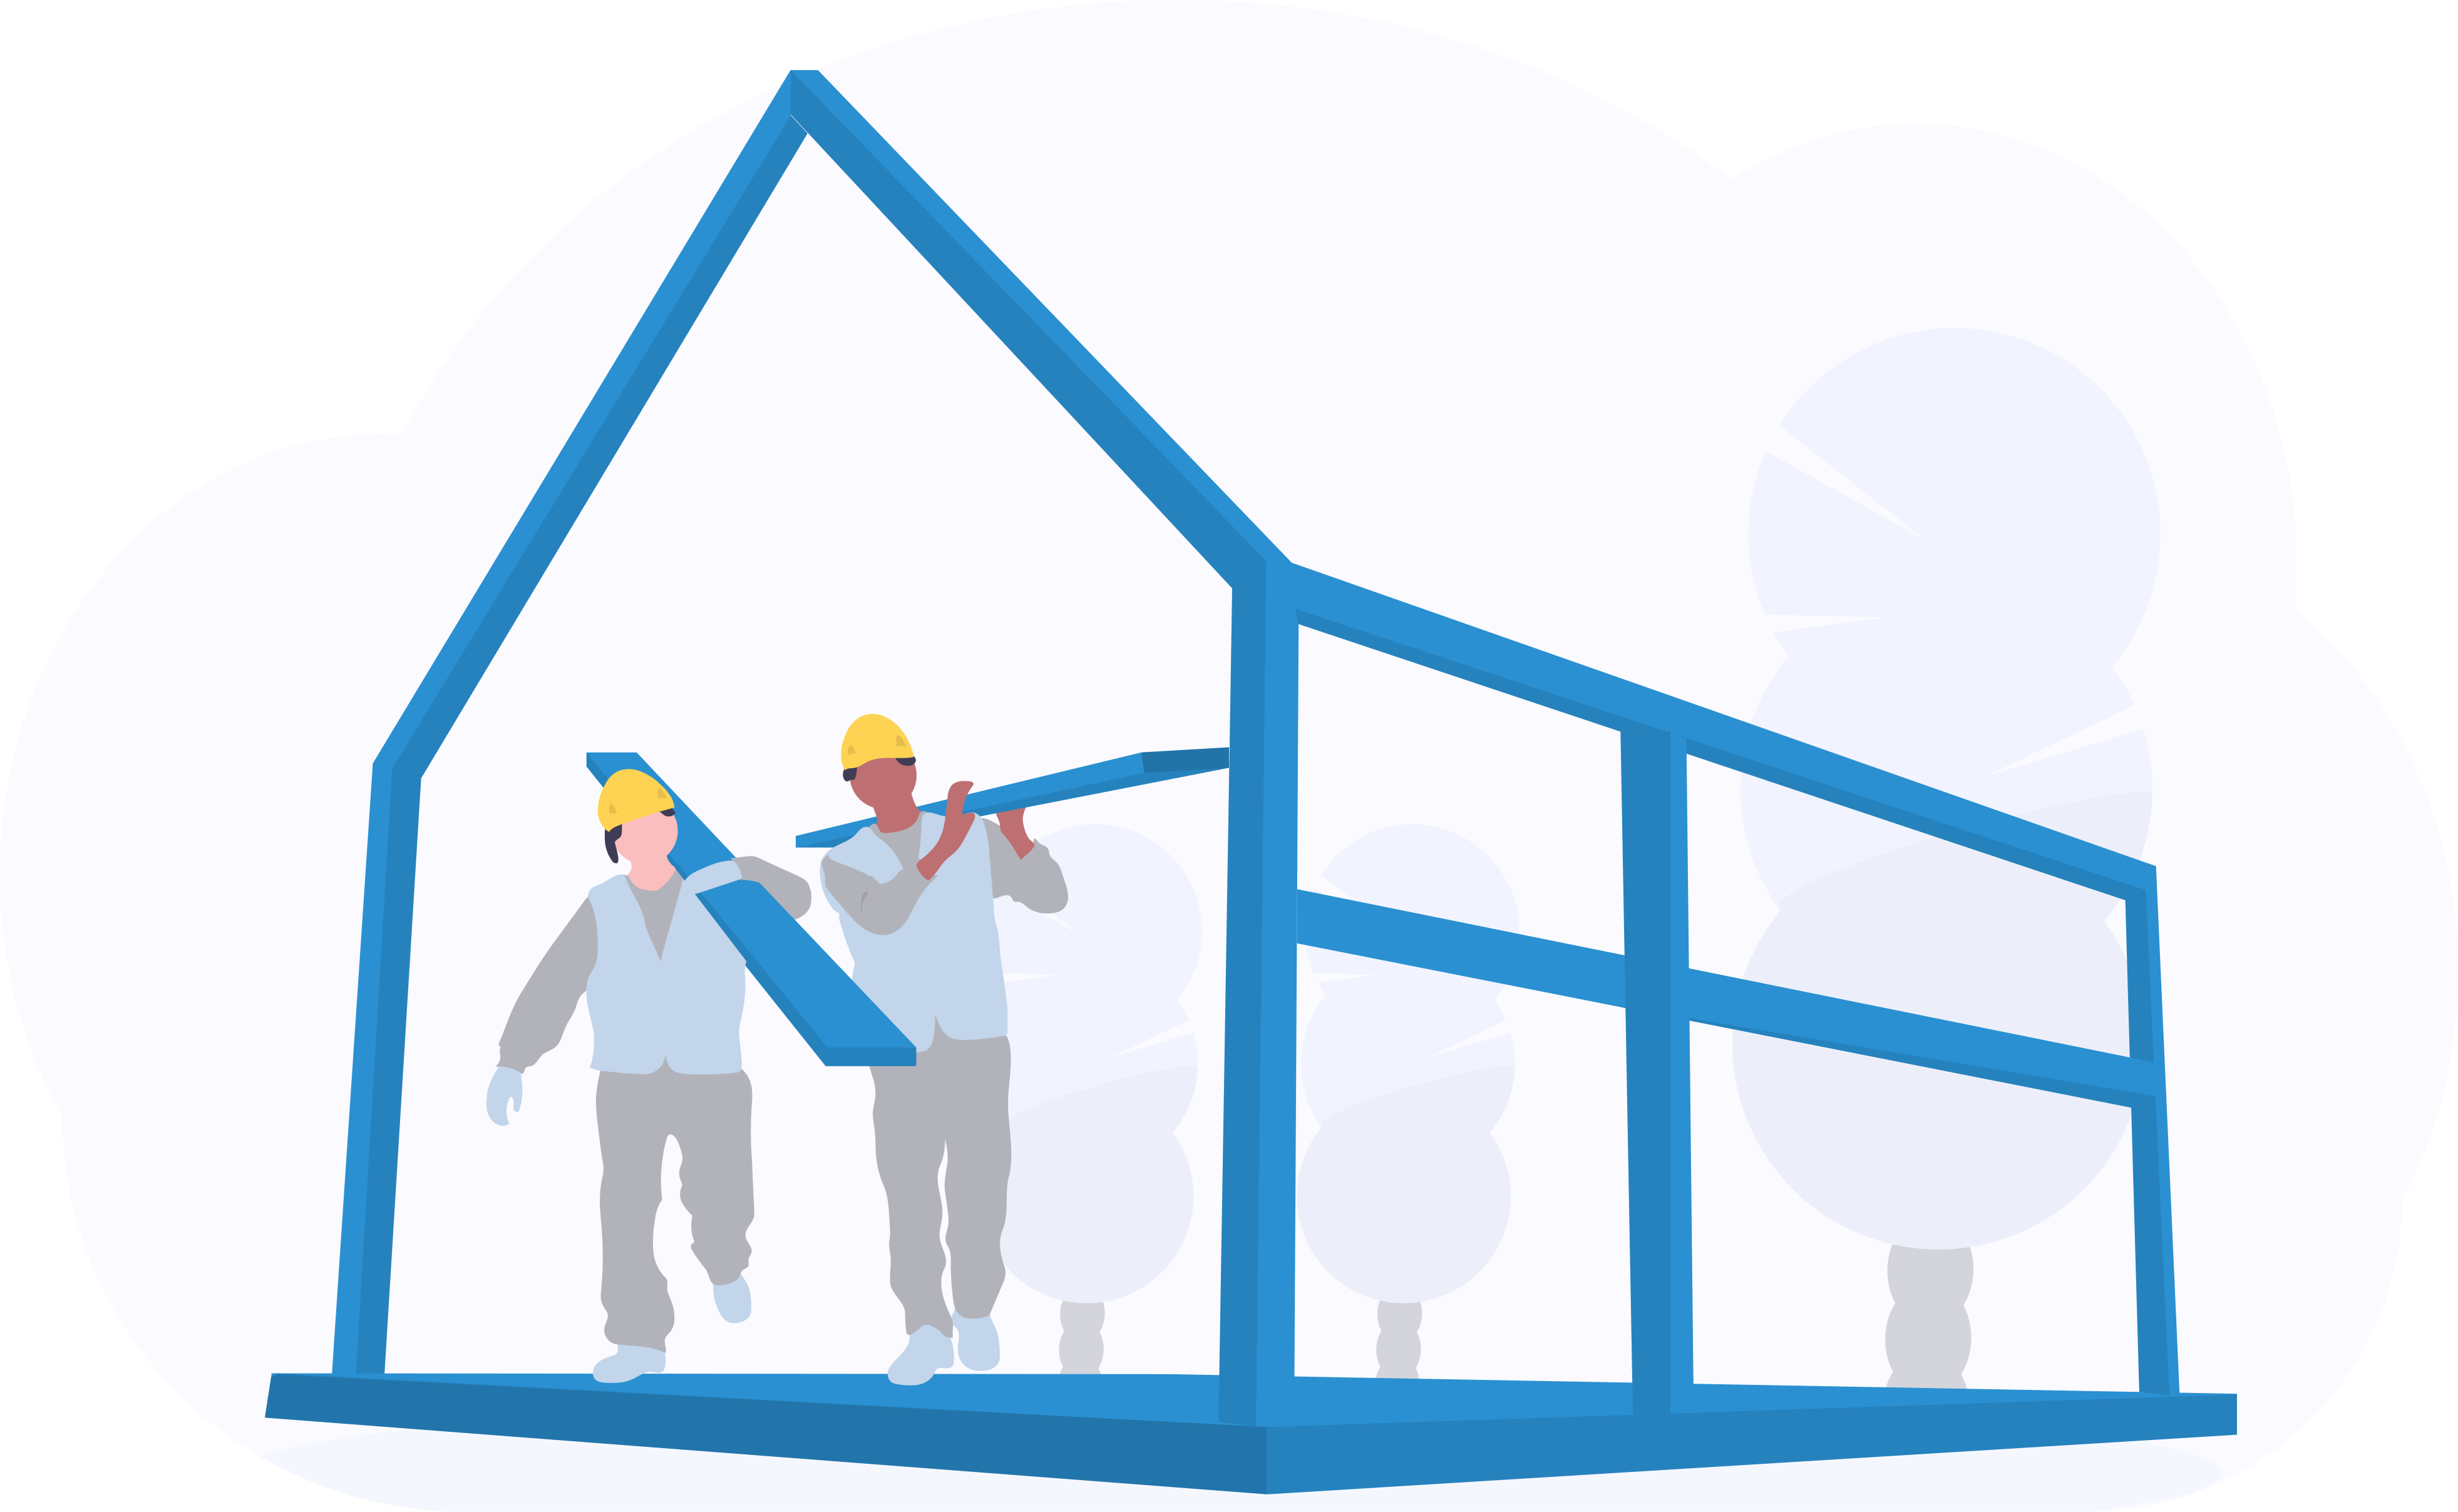 Bauarbeiter unfertiges Haus